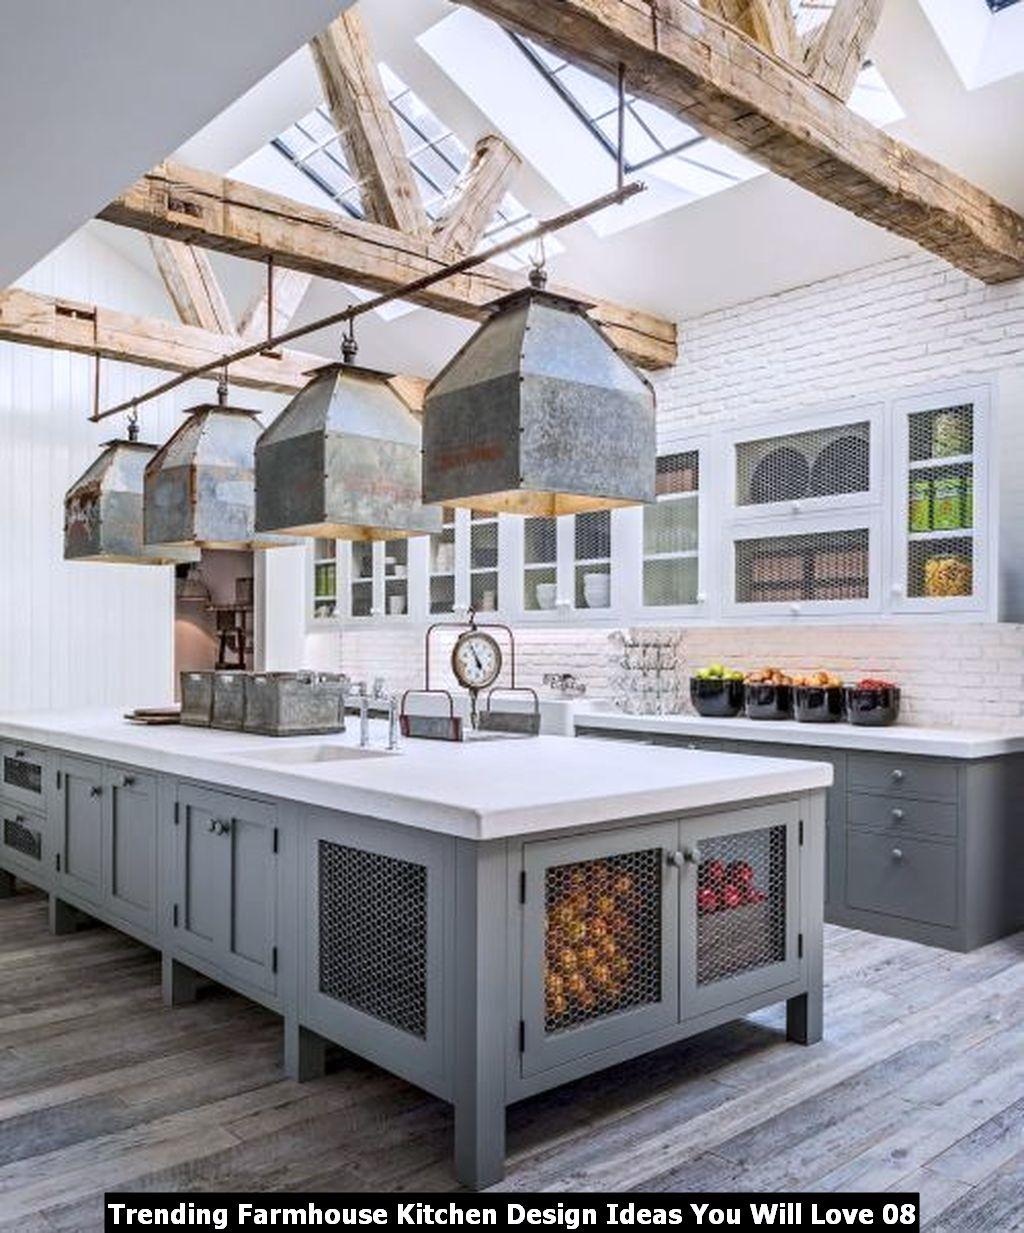 Trending Farmhouse Kitchen Design Ideas You Will Love 08